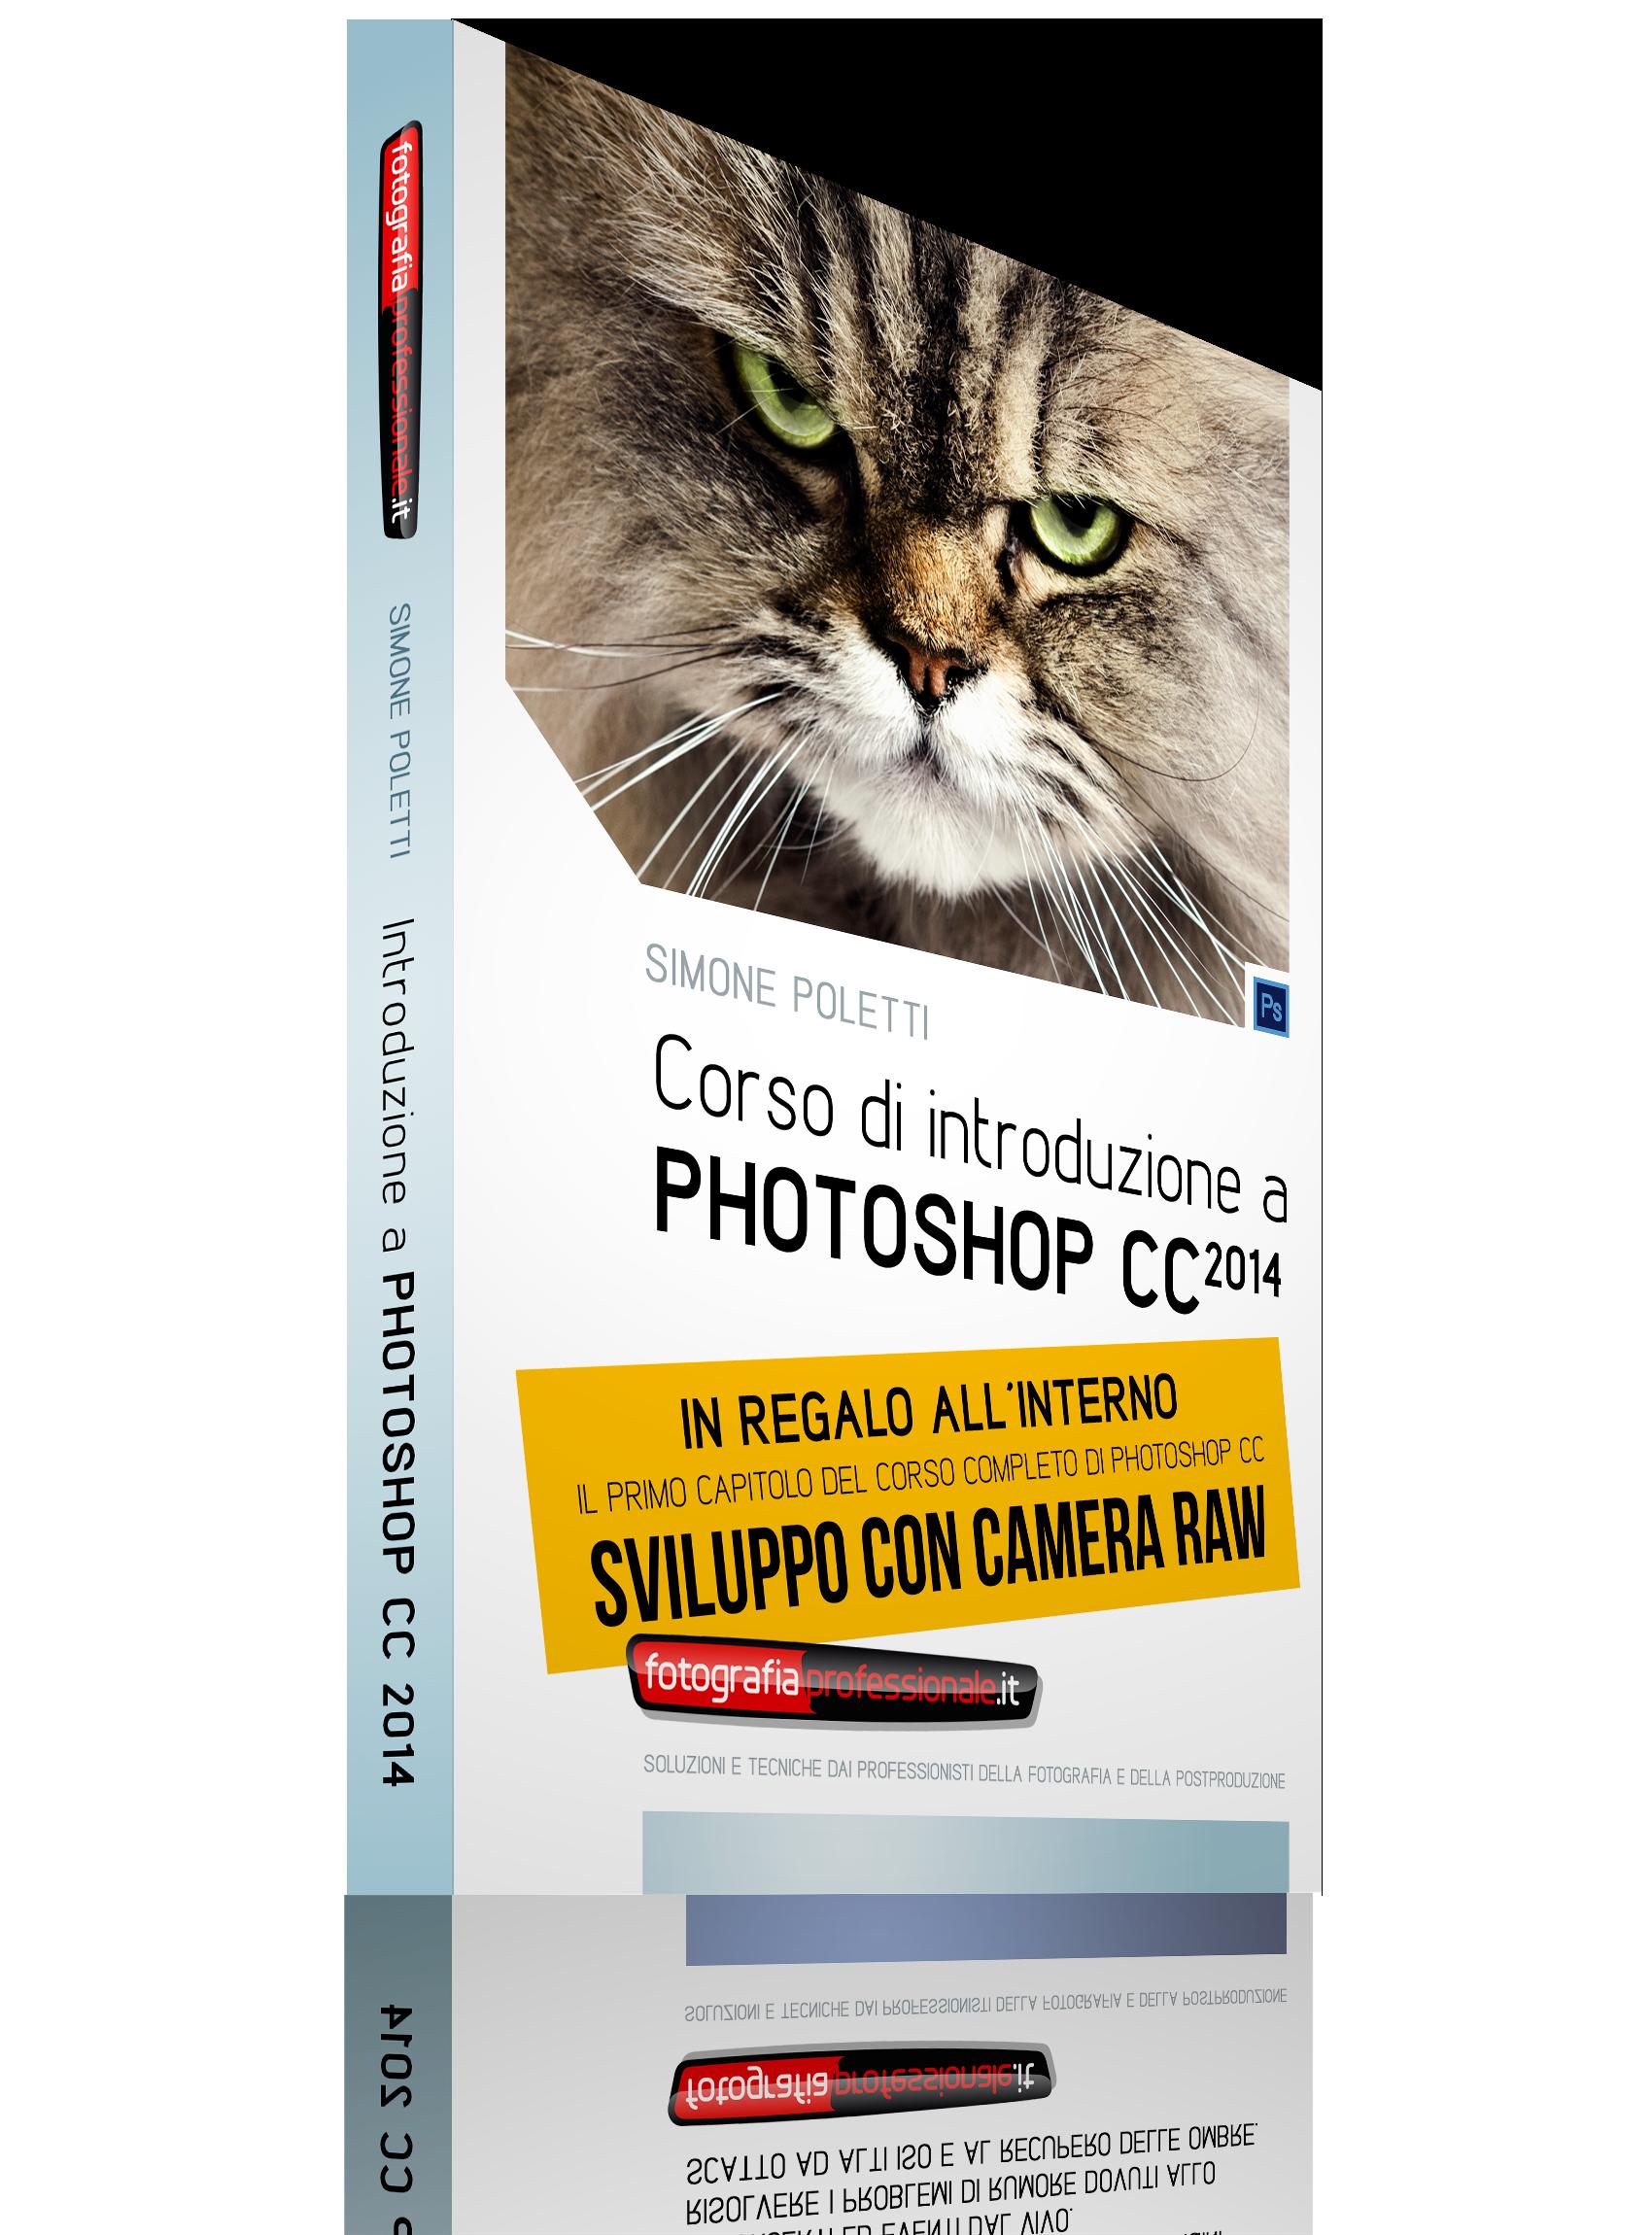 Corso di Introduzione a Photoshop CC 2014 + Camera Raw